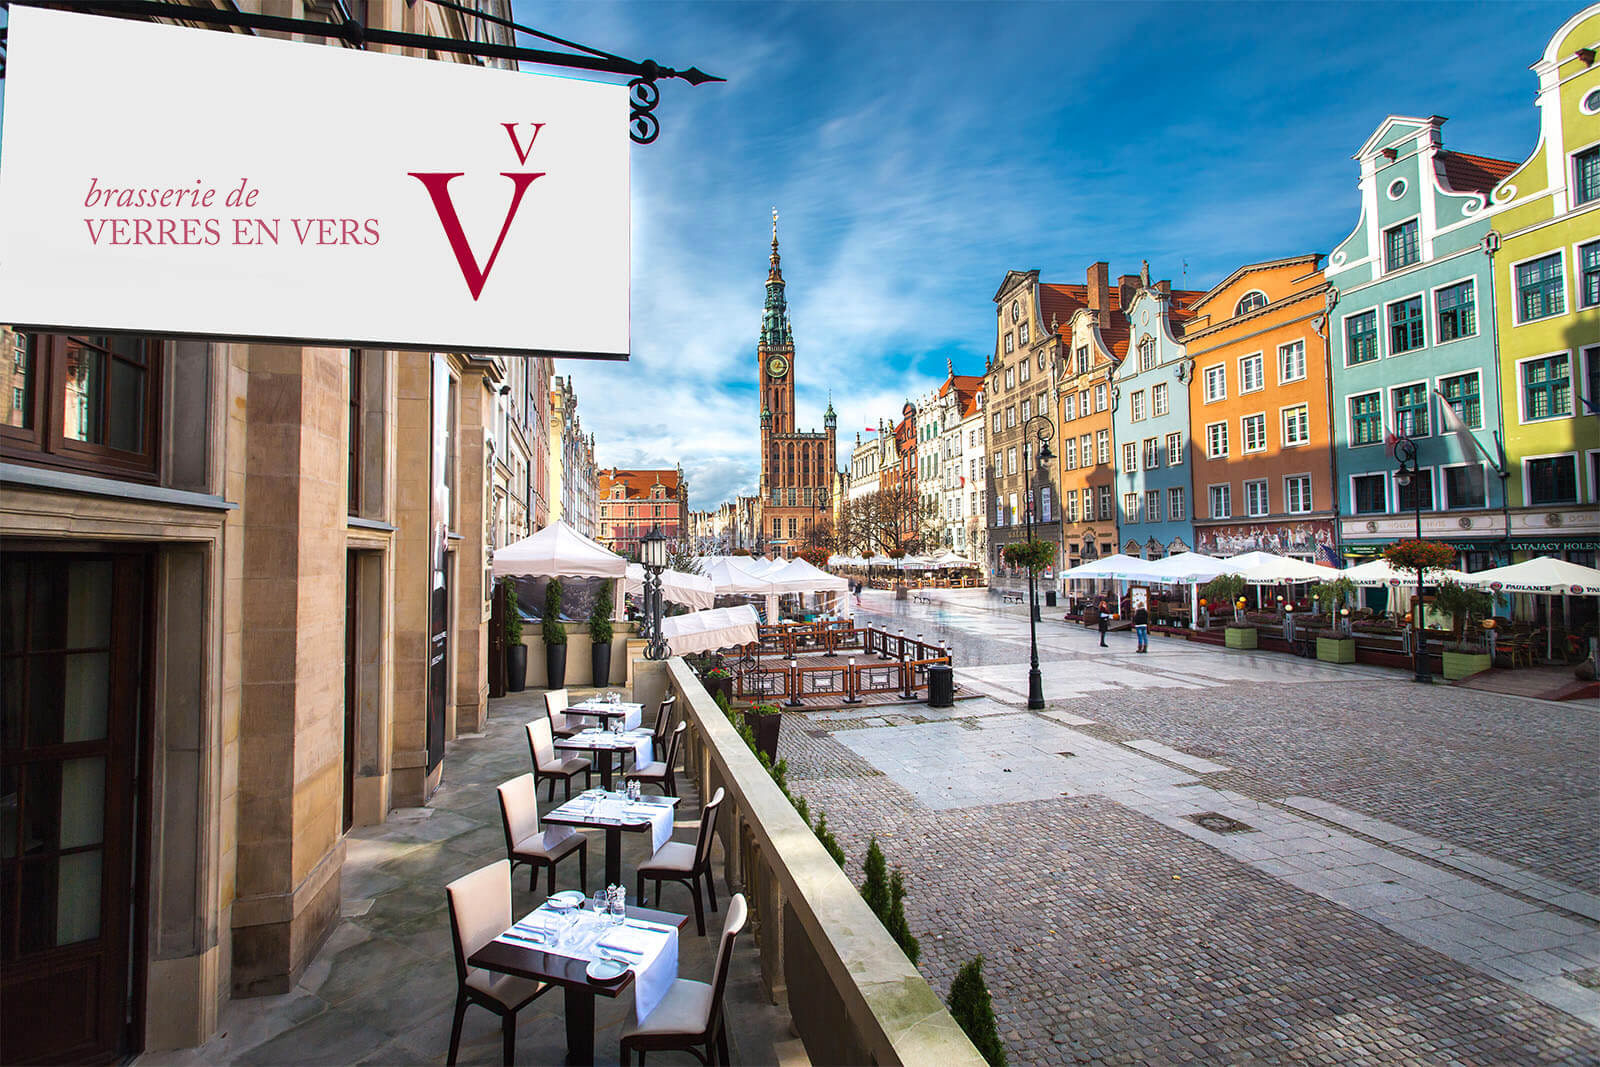 Hotel Brasserie Verres En Vers Restauracja Francuska Gdańsk